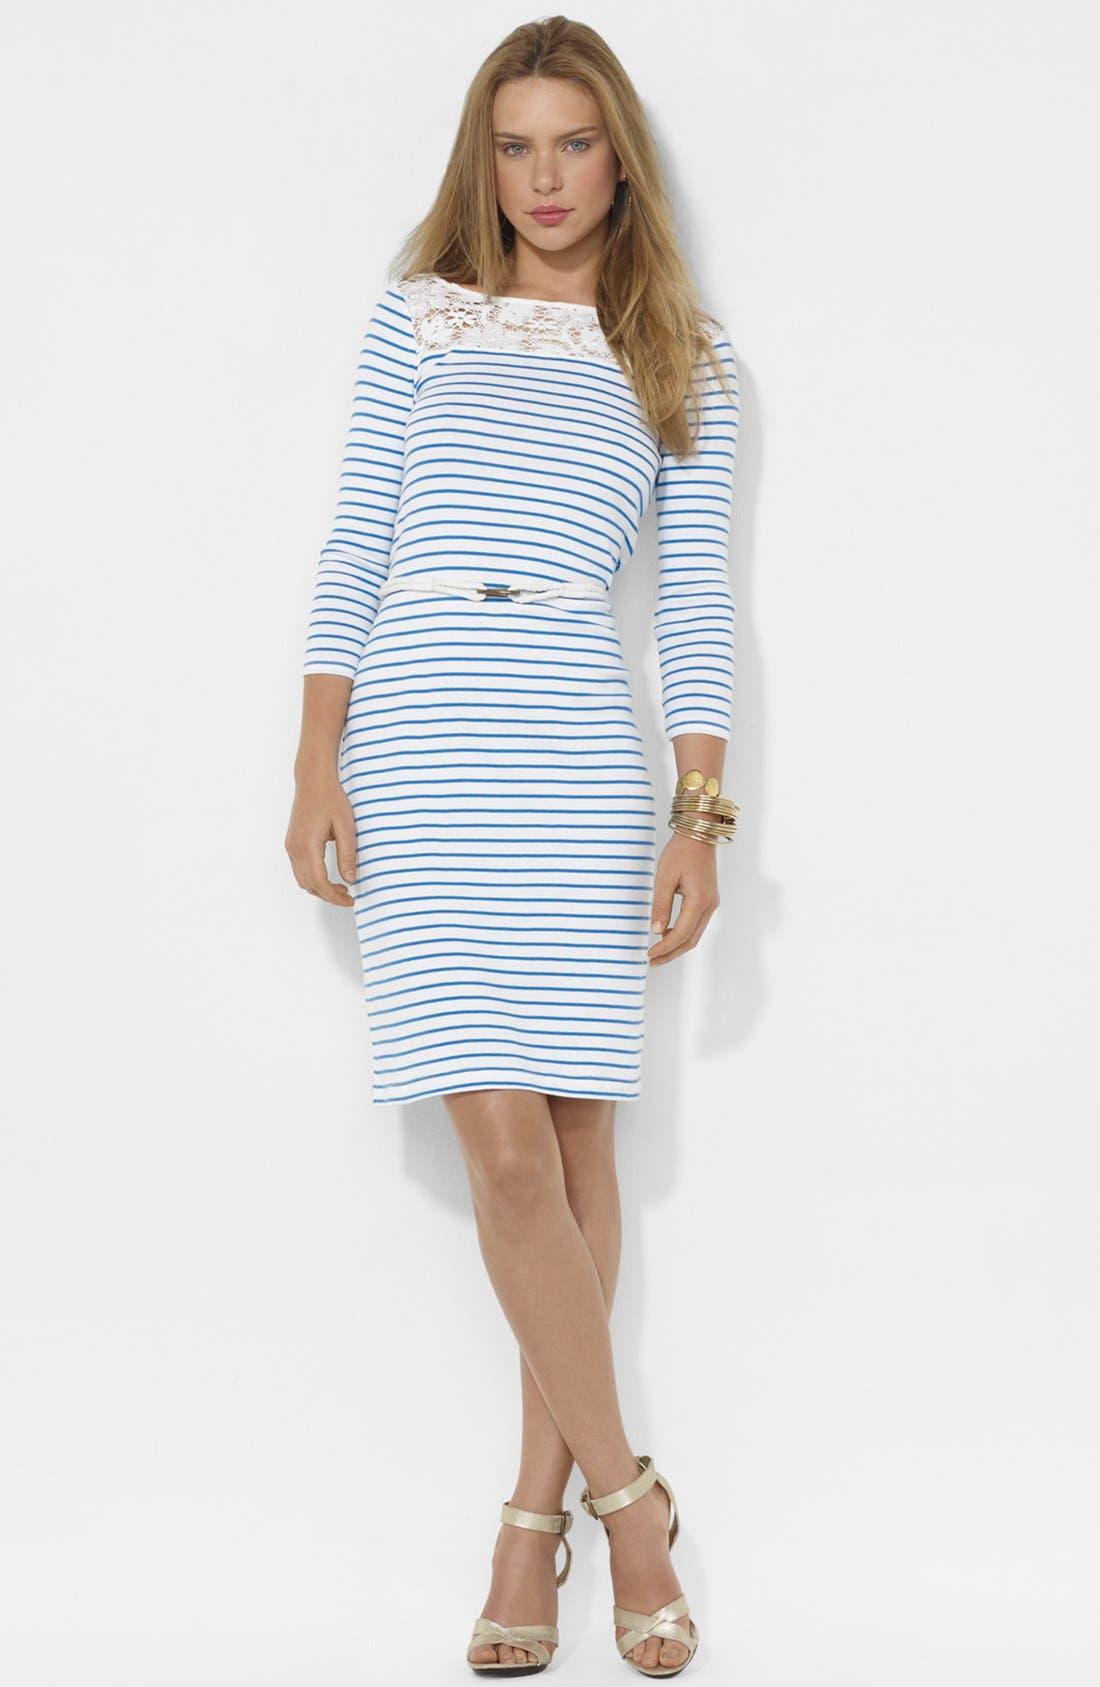 Alternate Image 1 Selected - Lauren Ralph Lauren Lace Trim Stripe Dress